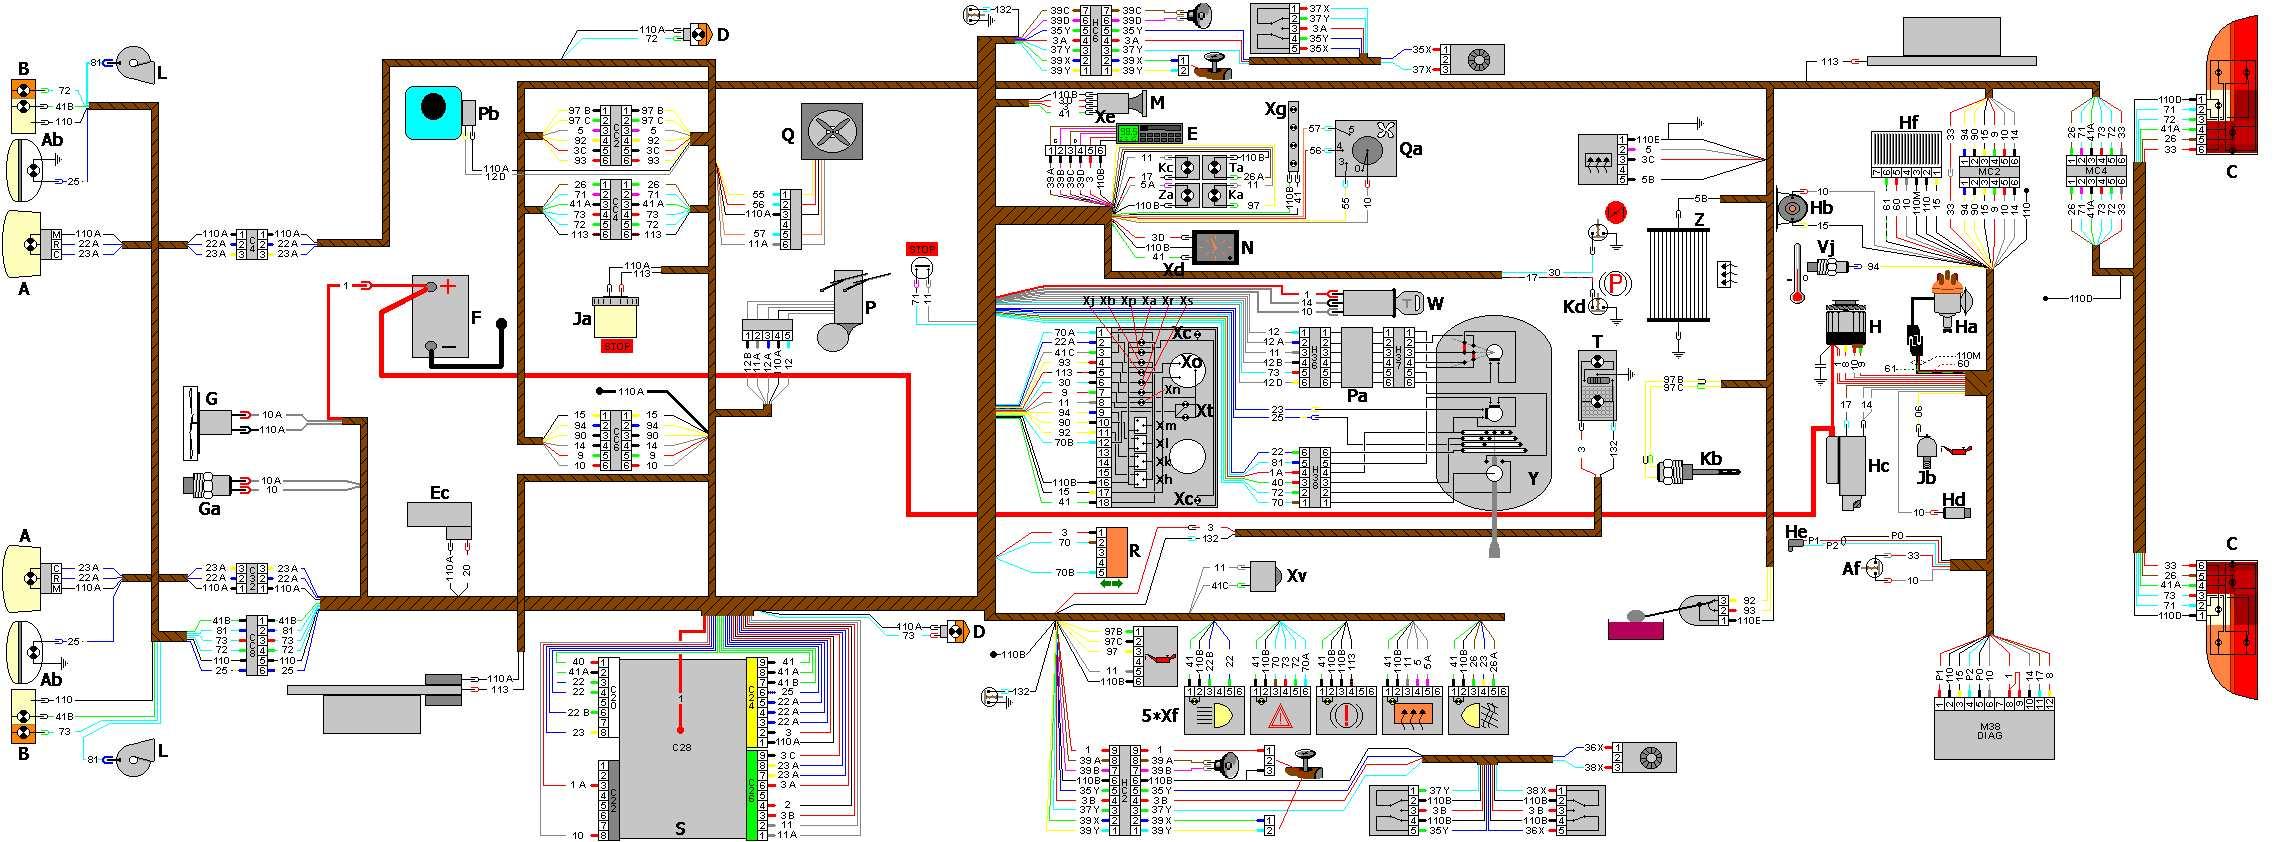 peugeot 306 wiring diagram central locking zd 9920  peugeot 806 central locking wiring diagram schematic wiring  peugeot 806 central locking wiring